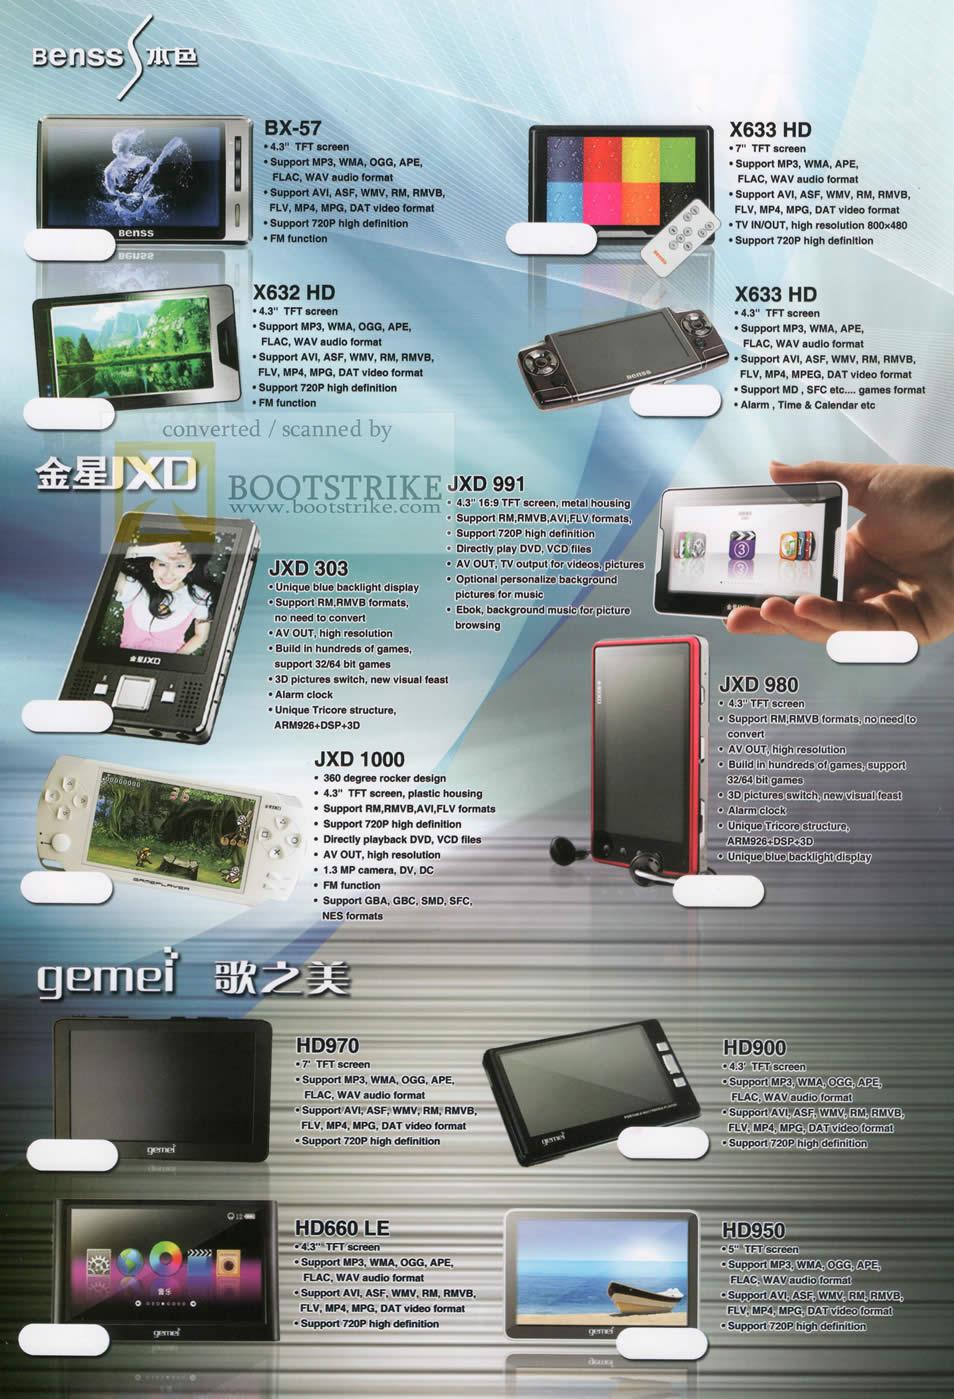 Sitex 2009 price list image brochure of Hai Xin Rui Portable Video Player PVP Benss BX 57 X633 X632 JXD 991 303 1000 980 Gemei